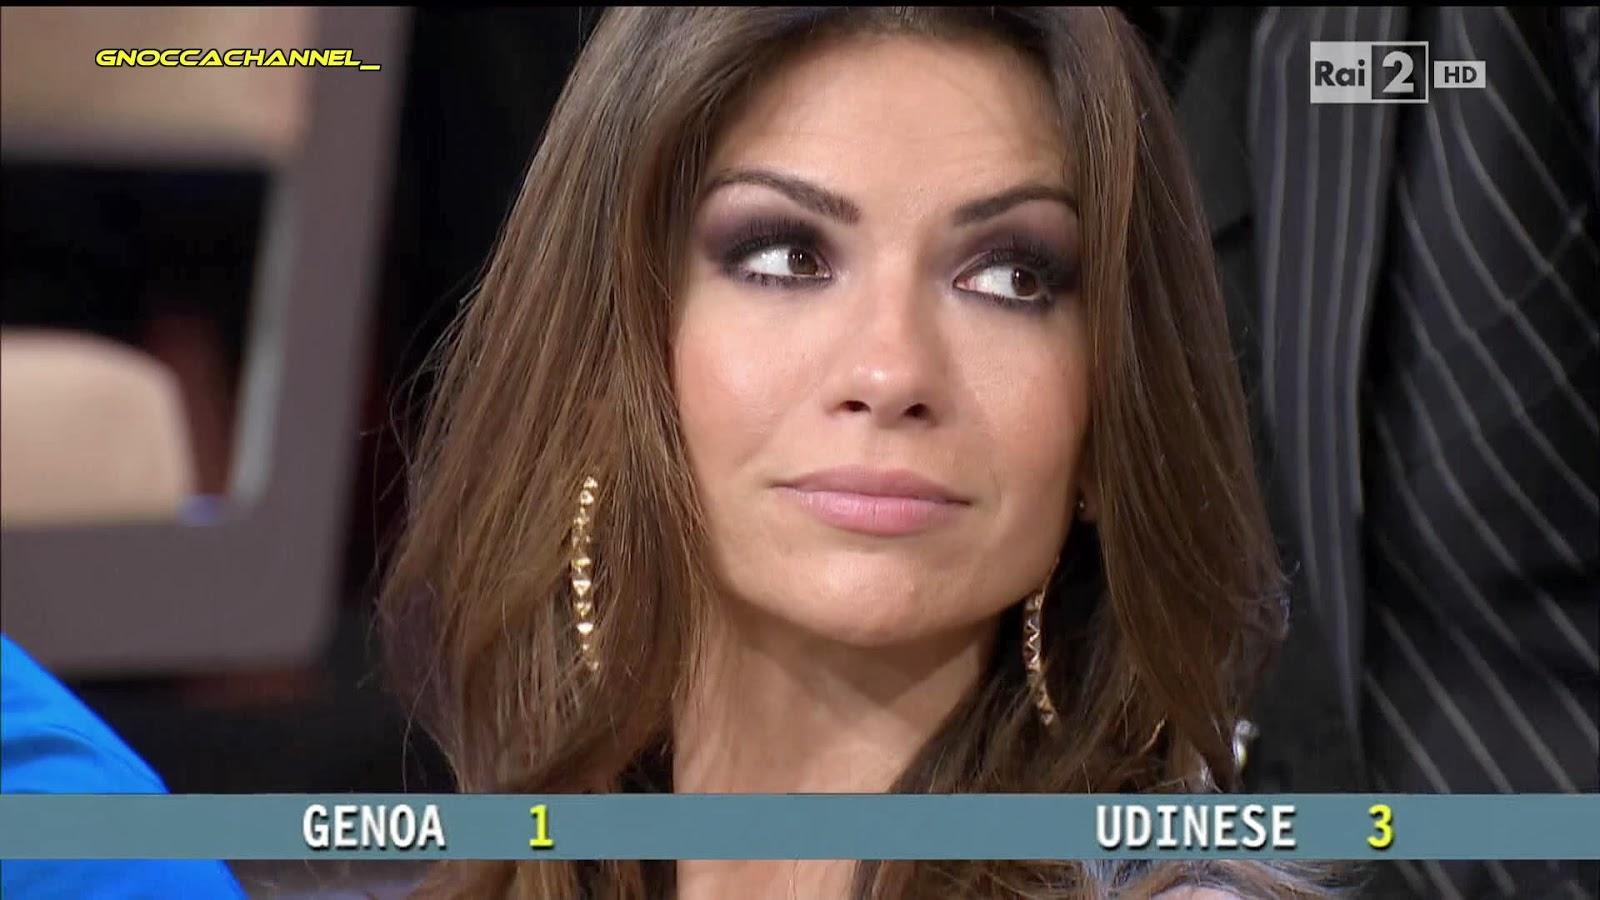 Eurotic TV - CelebrityDreamFeet Forum